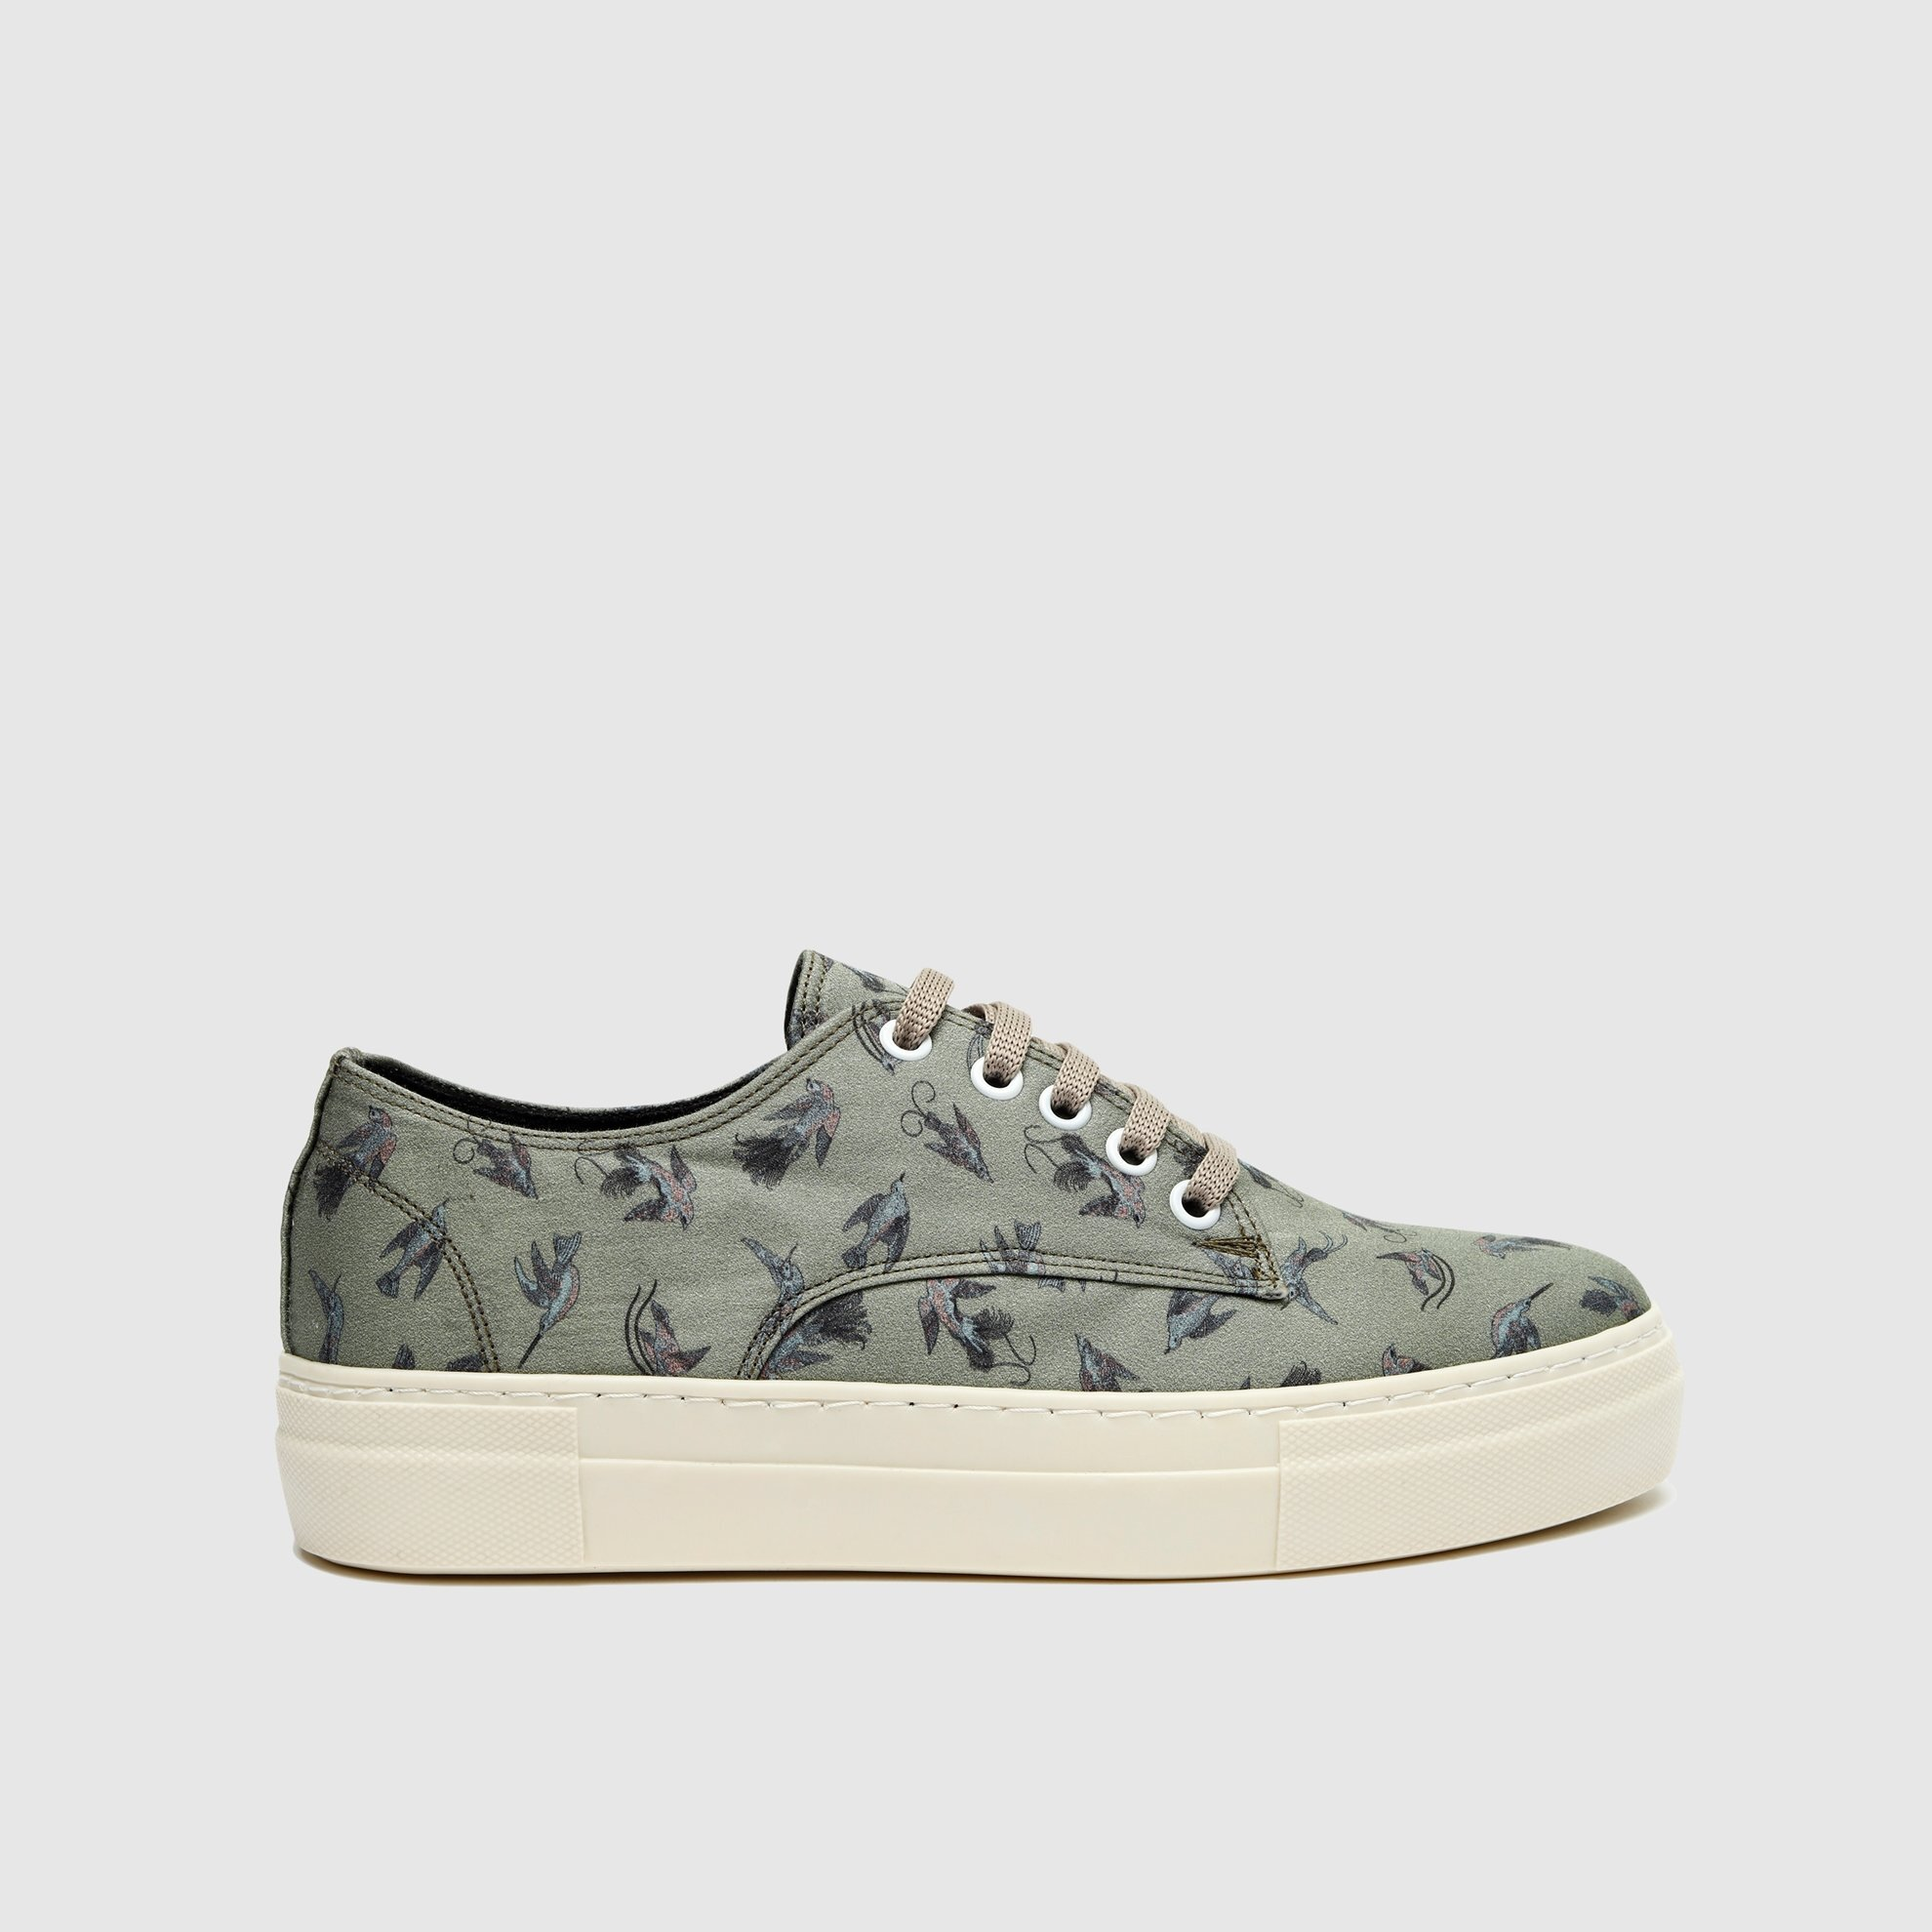 on sale 1a750 8ecb2 Sneaker aus Stoff